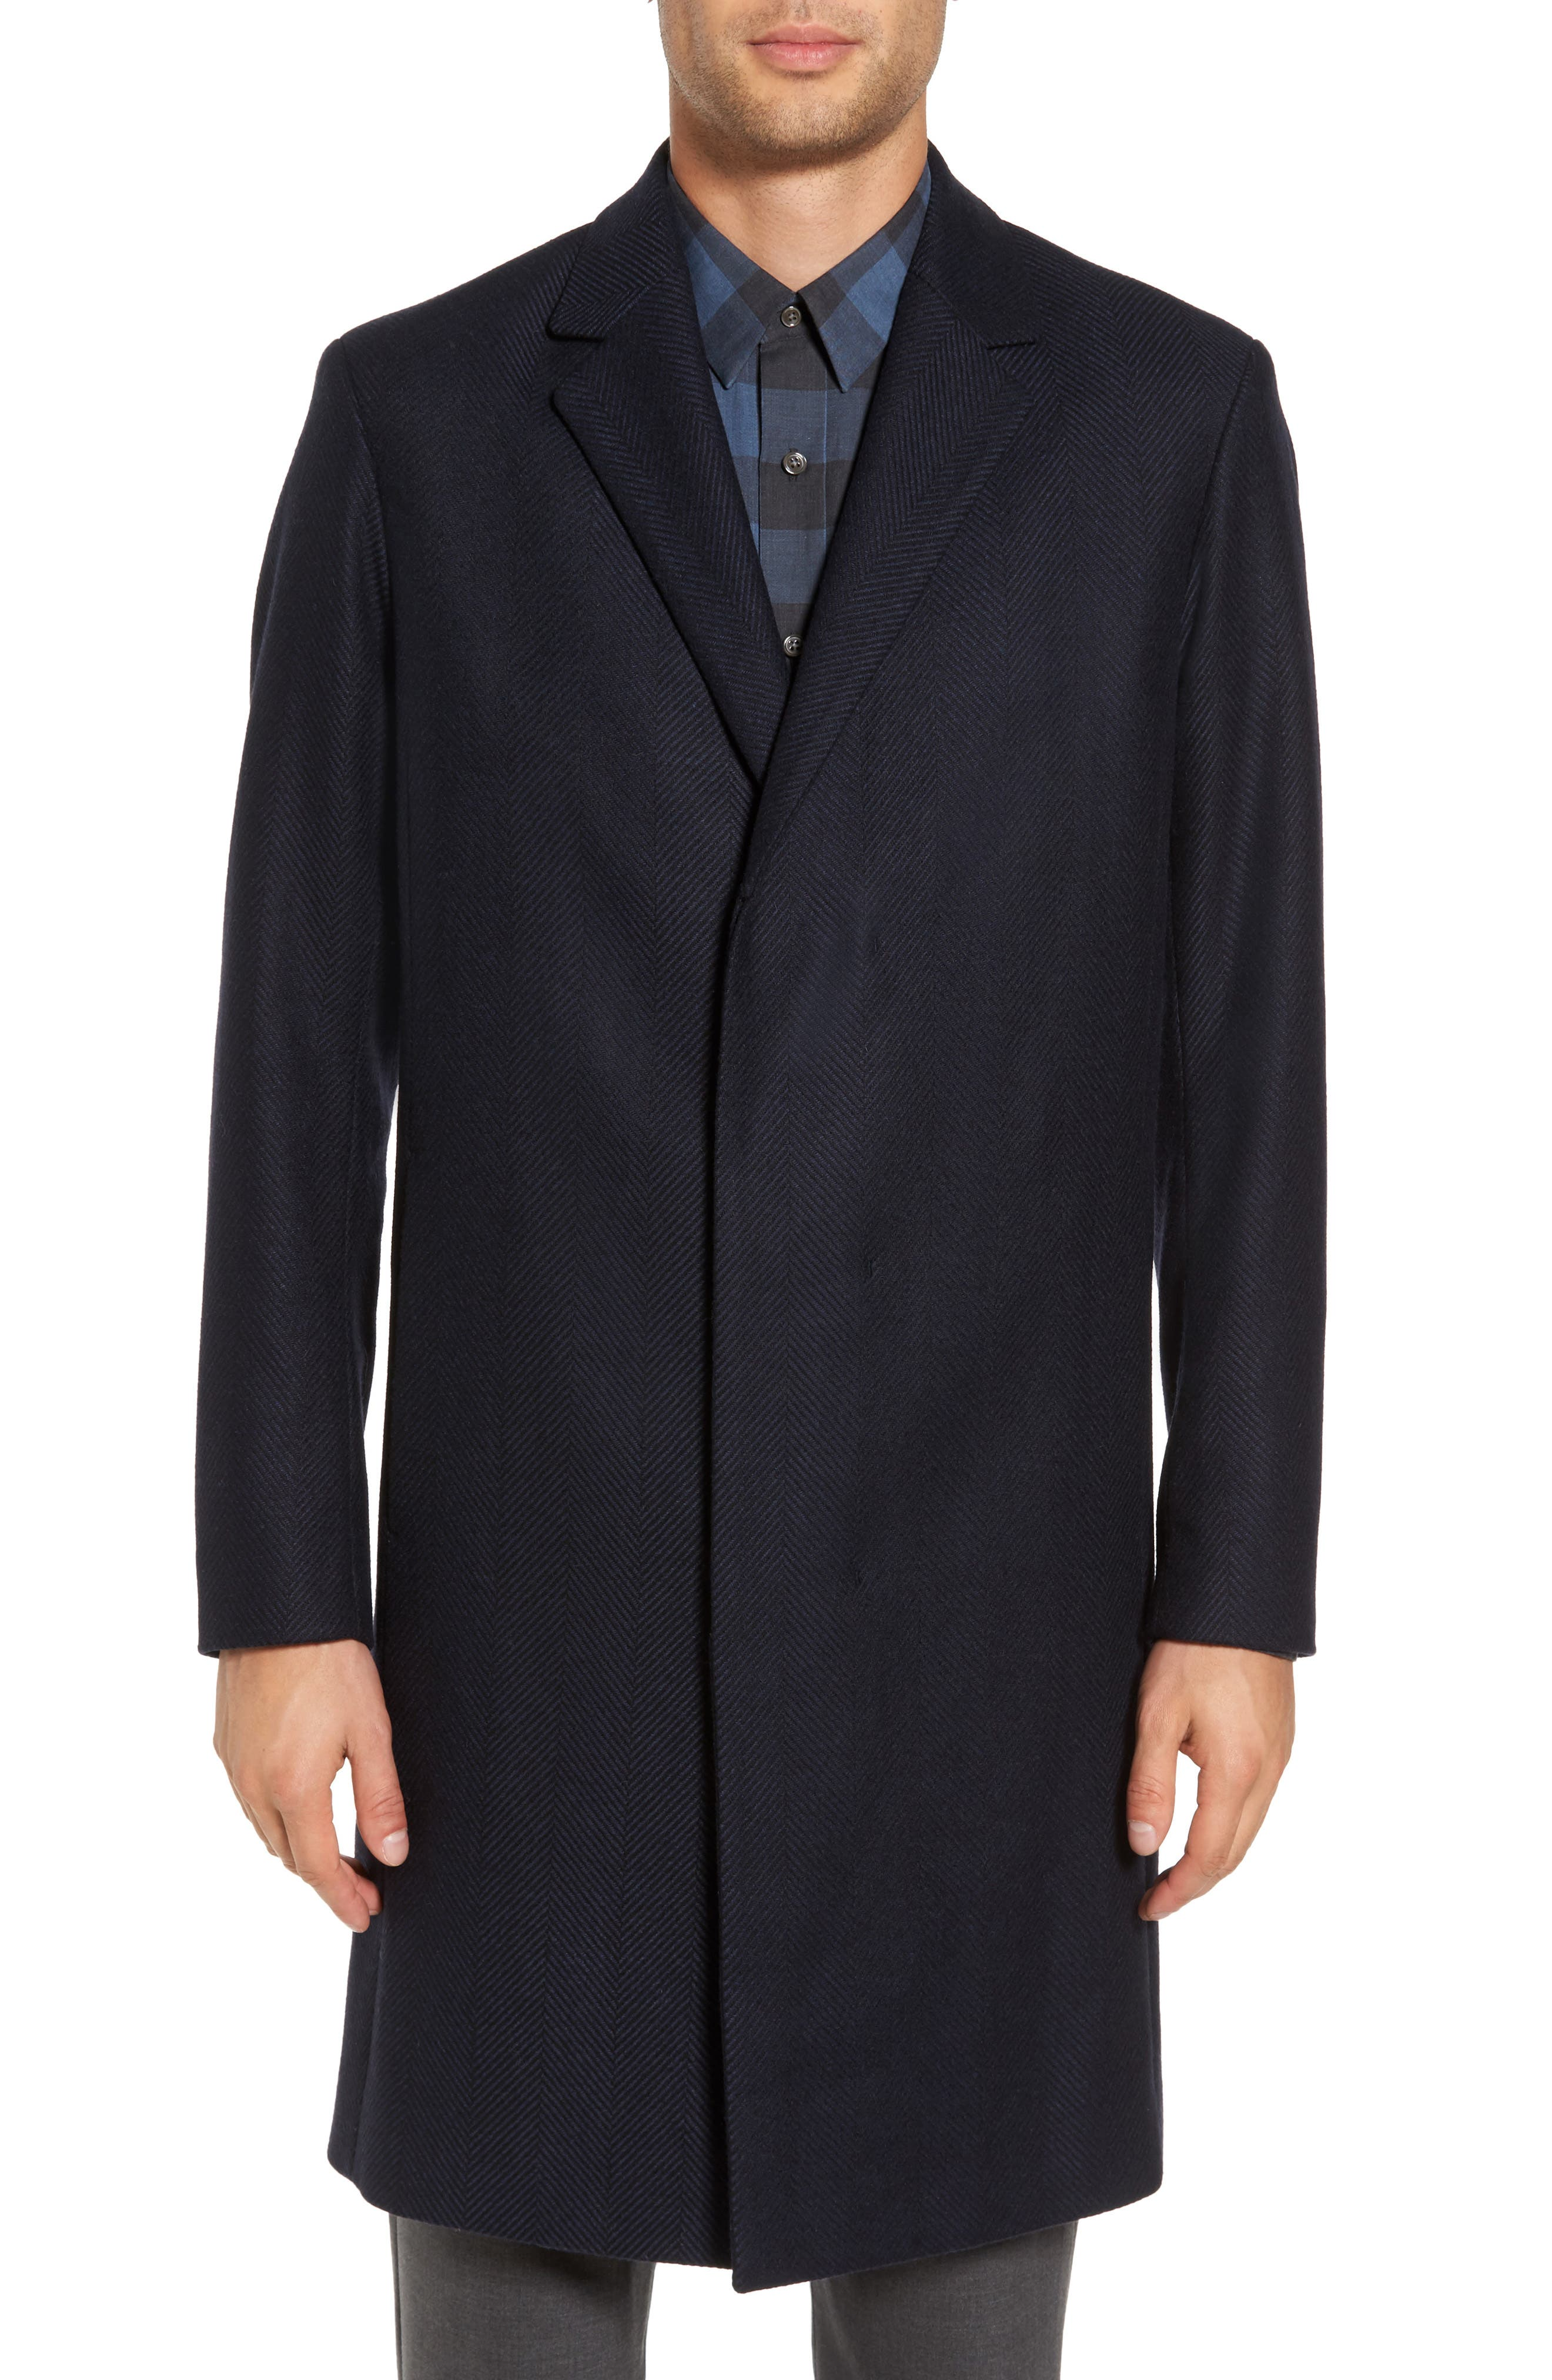 Bower Herringbone Wool Blend Topcoat,                             Alternate thumbnail 4, color,                             Liberty Multi